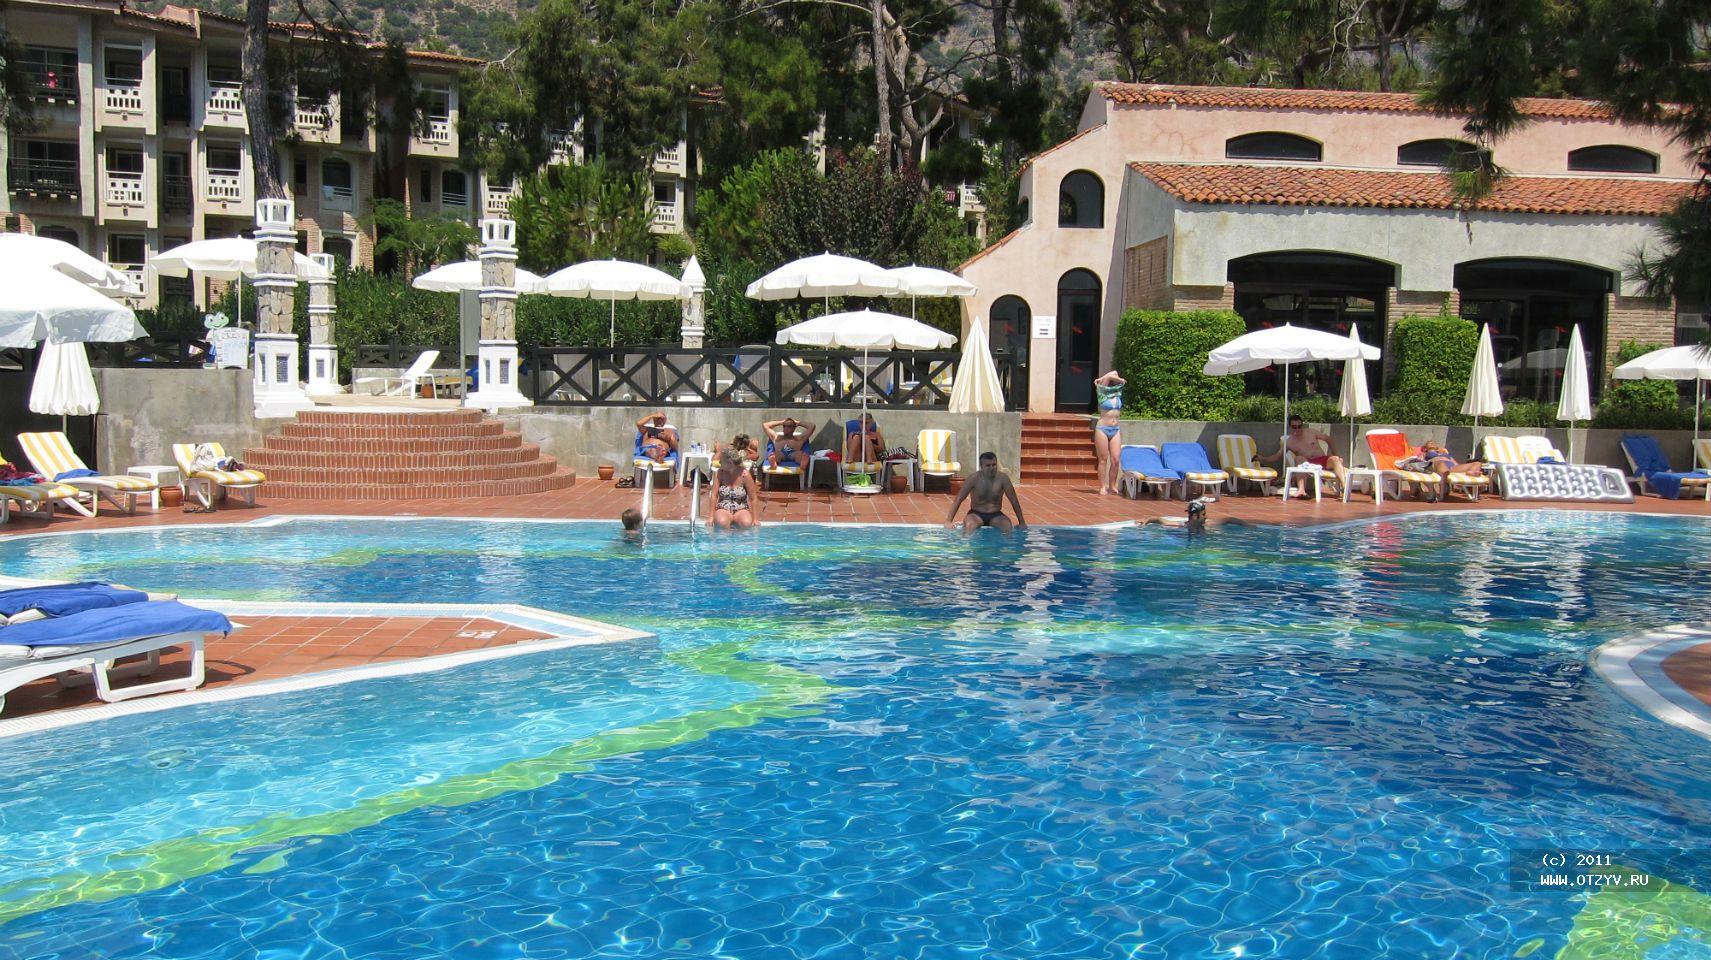 Oludeniz resort hotel pictures Contact m Customer Service